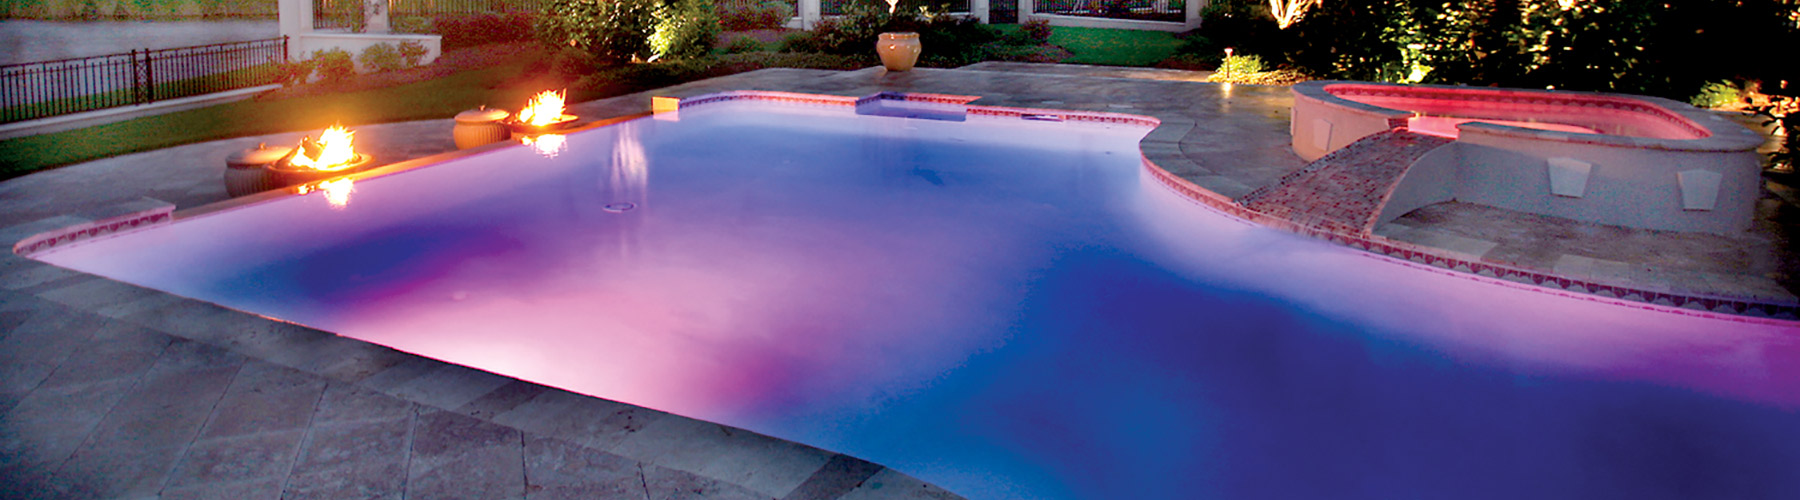 Swimming Pool Building Process